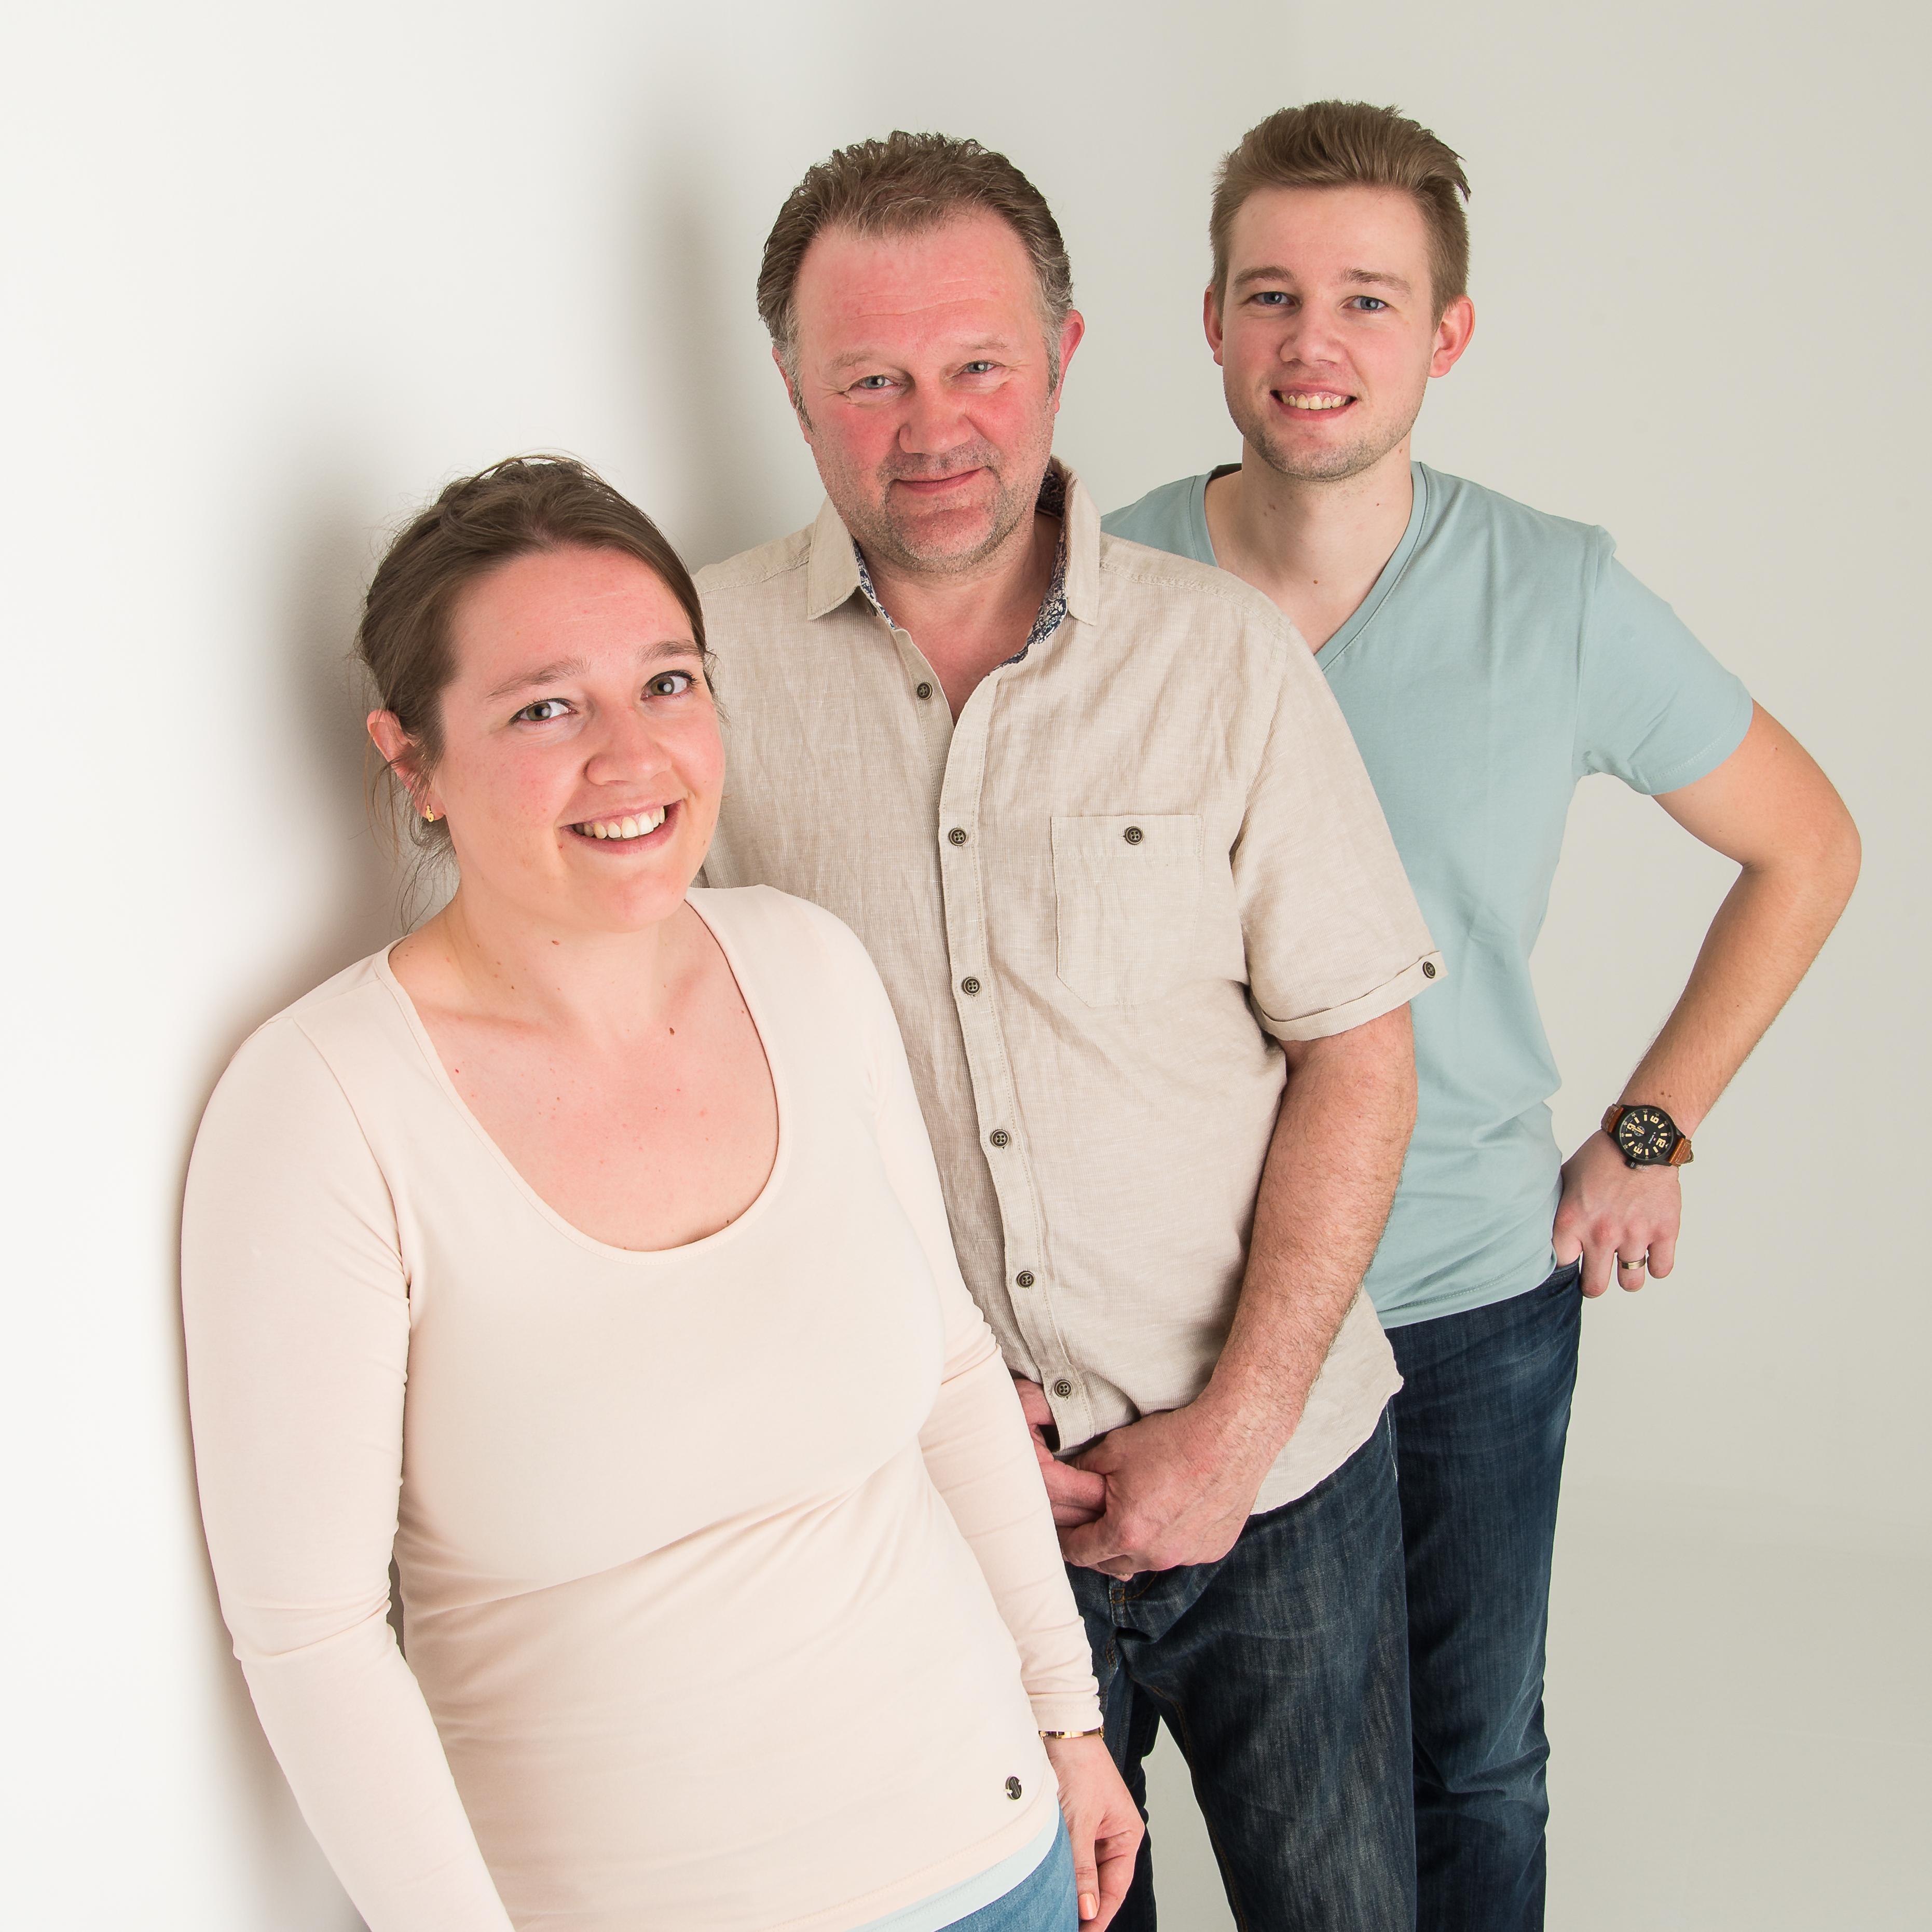 familie fotoshoot-15